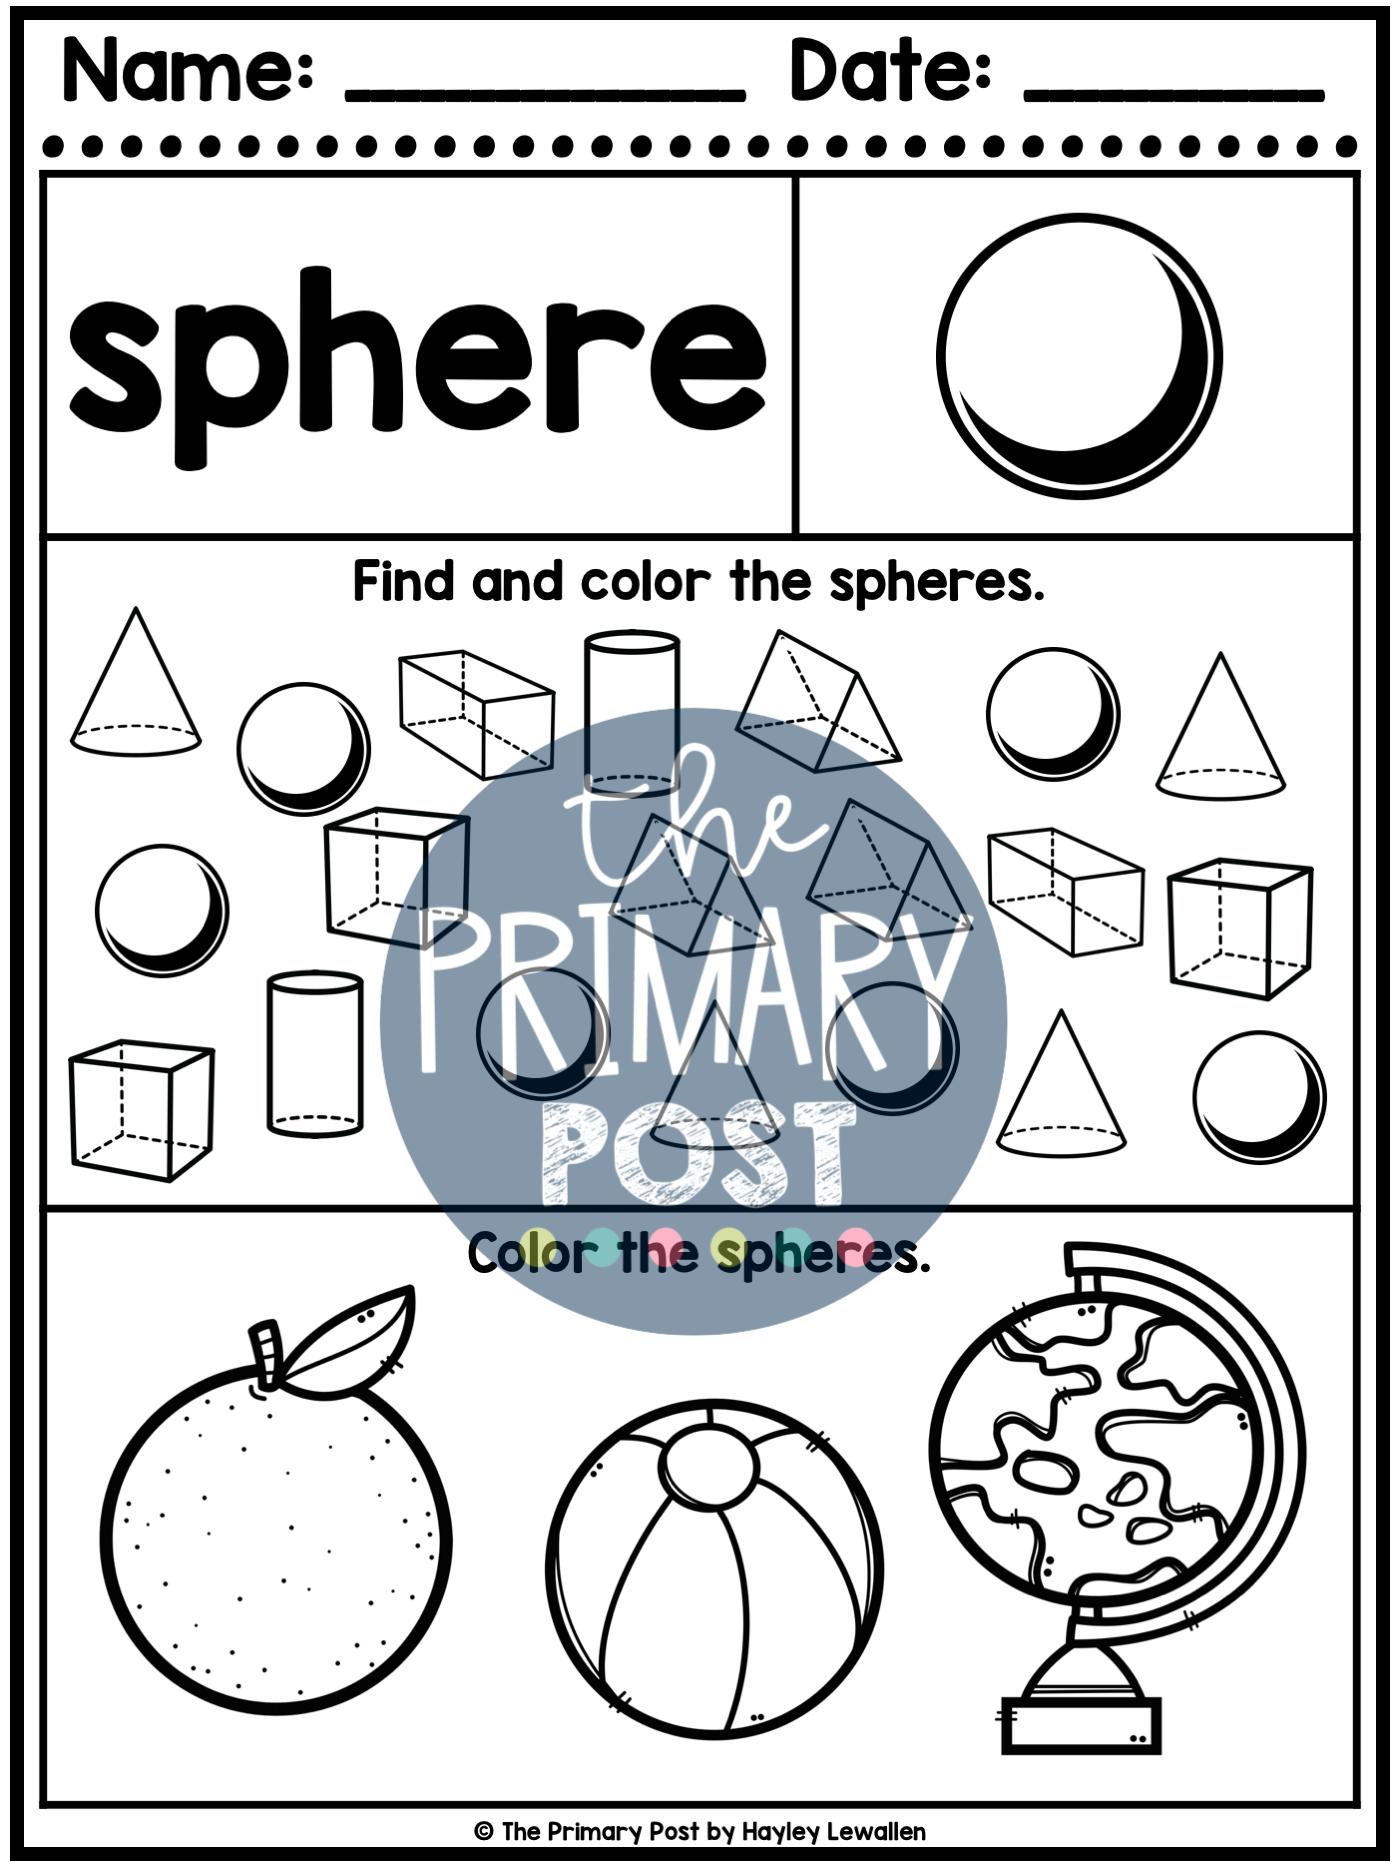 3d Shapes Worksheets Shapes Worksheets 3d Shapes Worksheets Teaching Shapes [ 1867 x 1400 Pixel ]